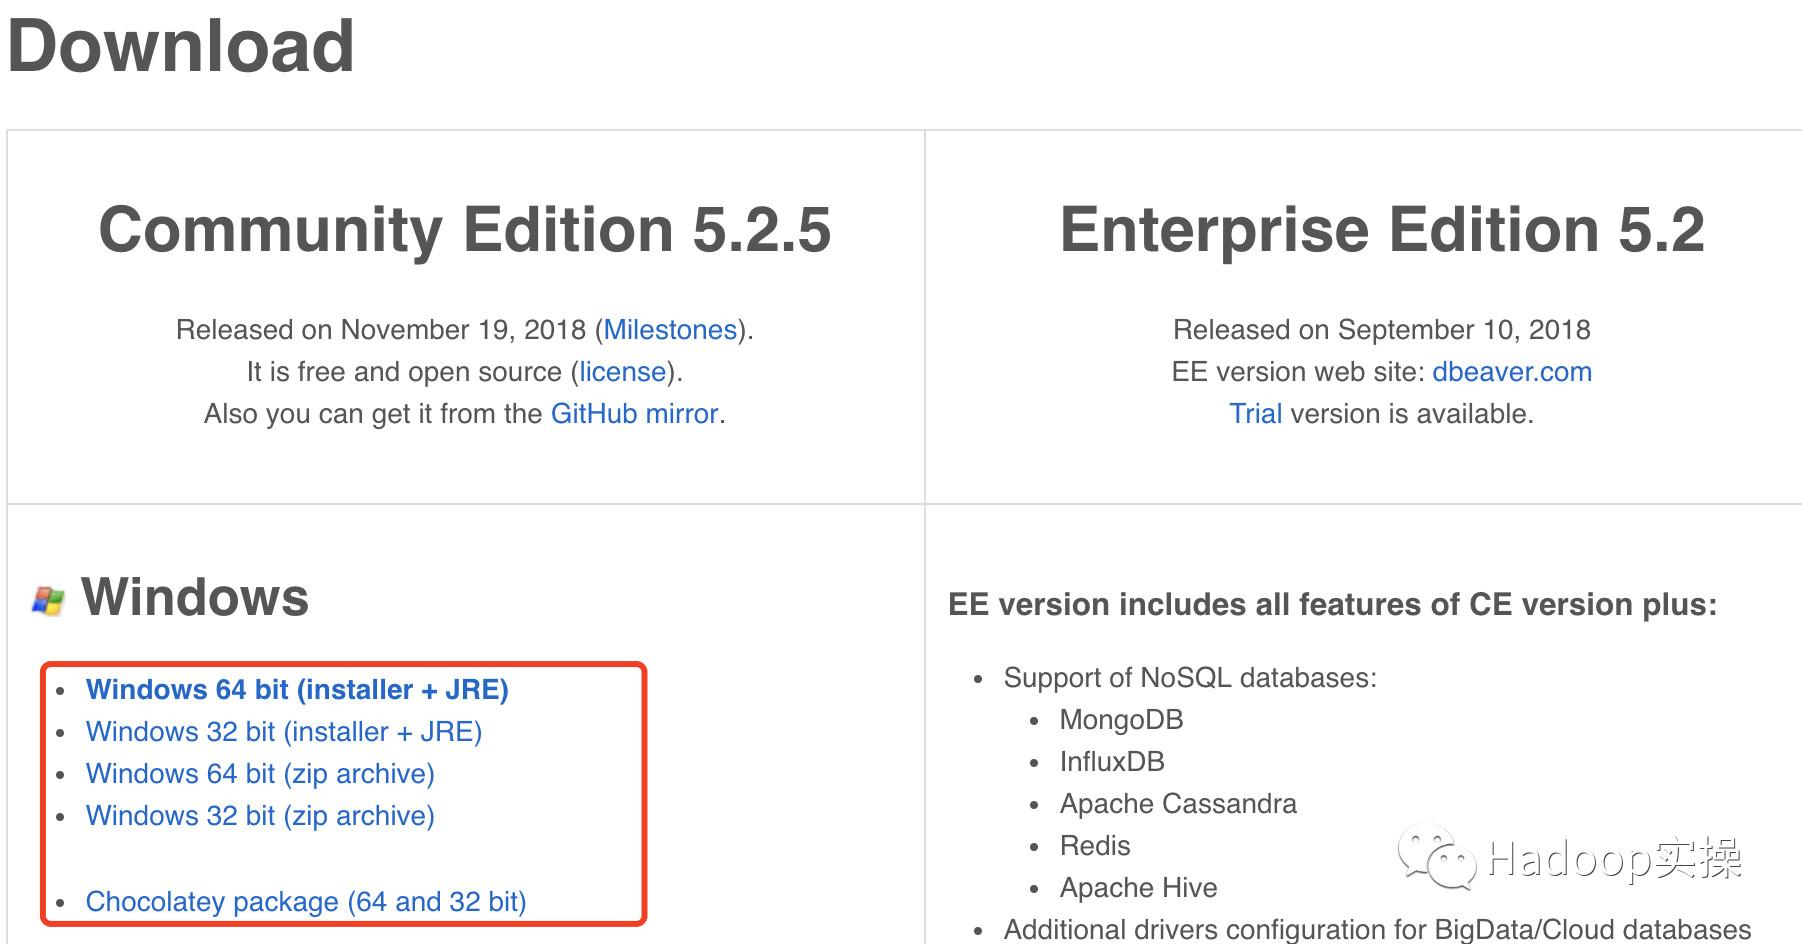 0467-Hadoop客户端工具之Dbeaver安装及使用- Hadoop_SC的博客- CSDN博客